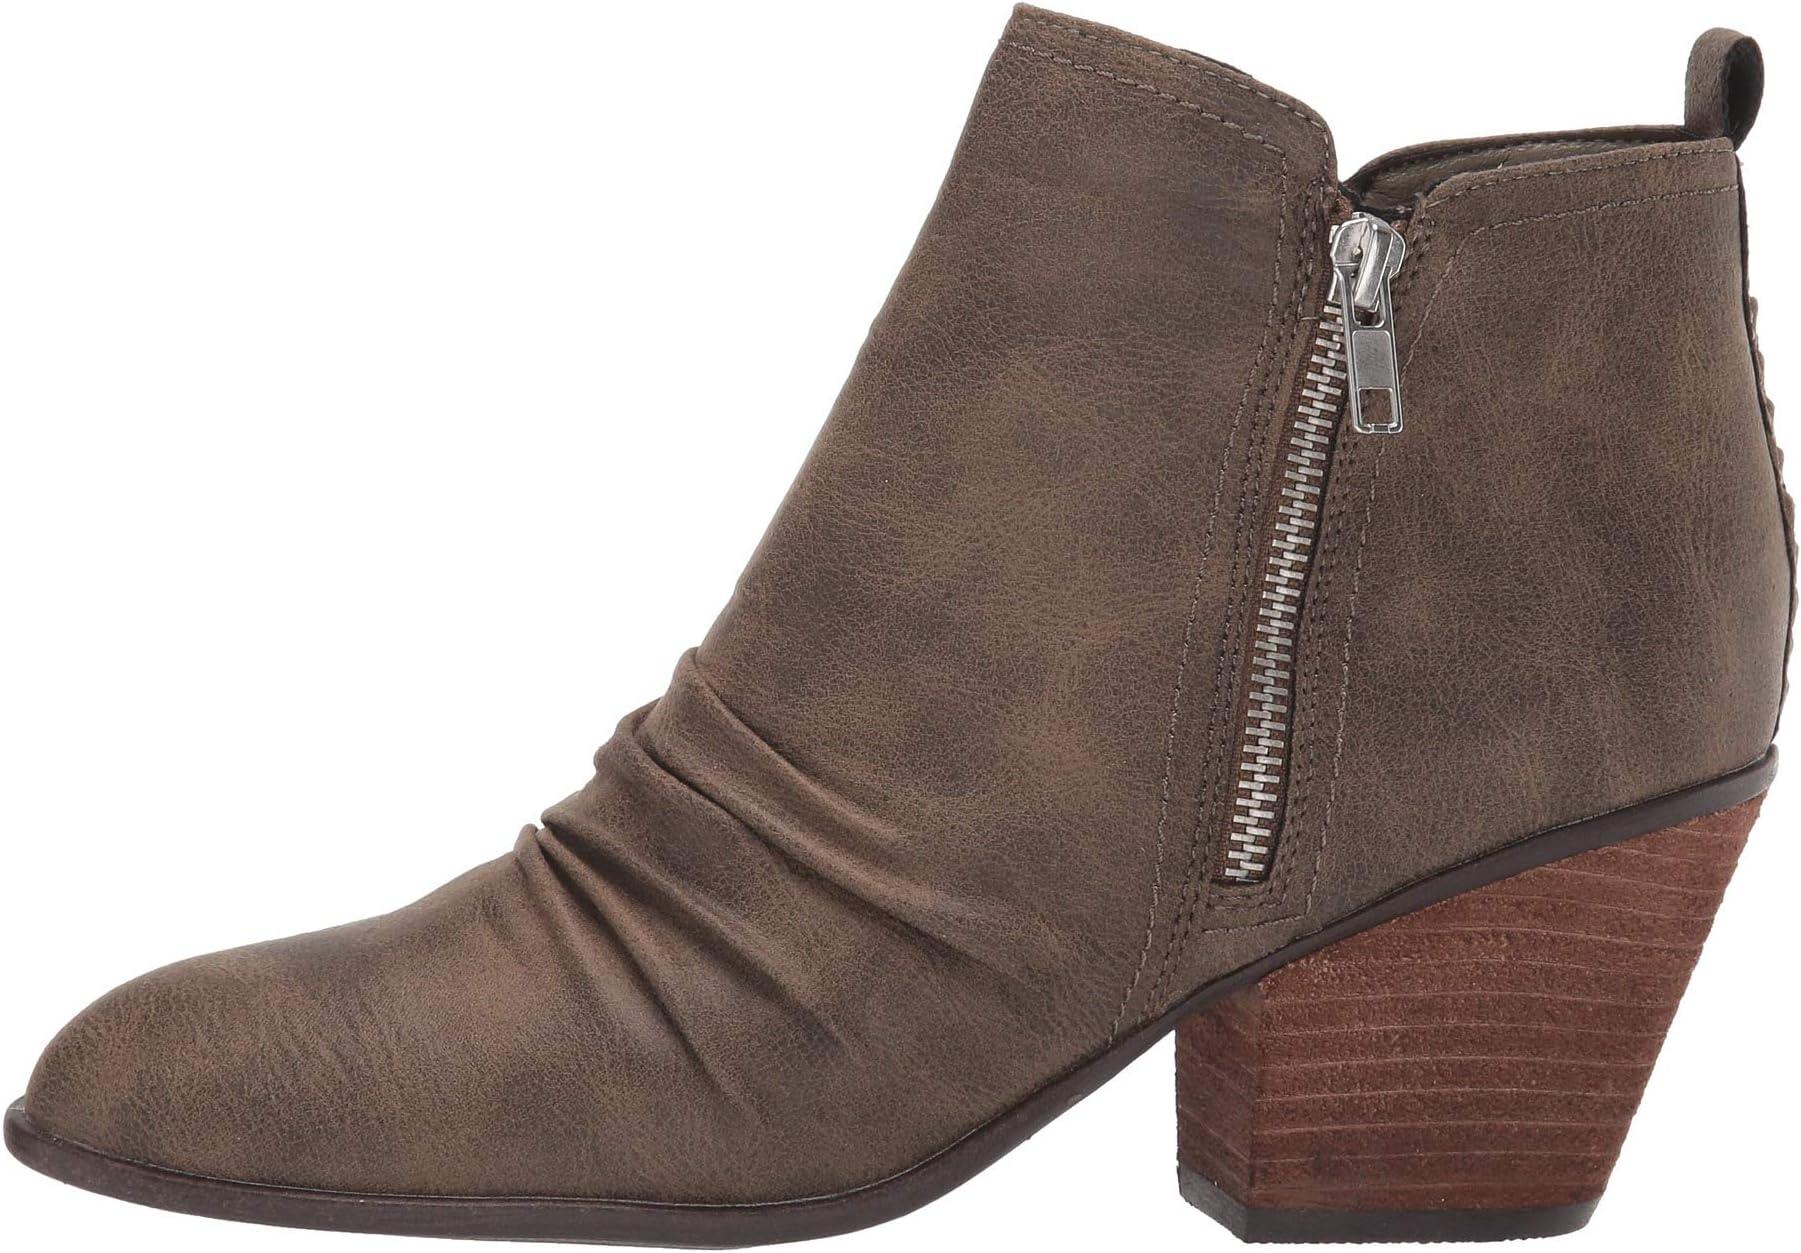 Report Yakub | Women's shoes | 2020 Newest